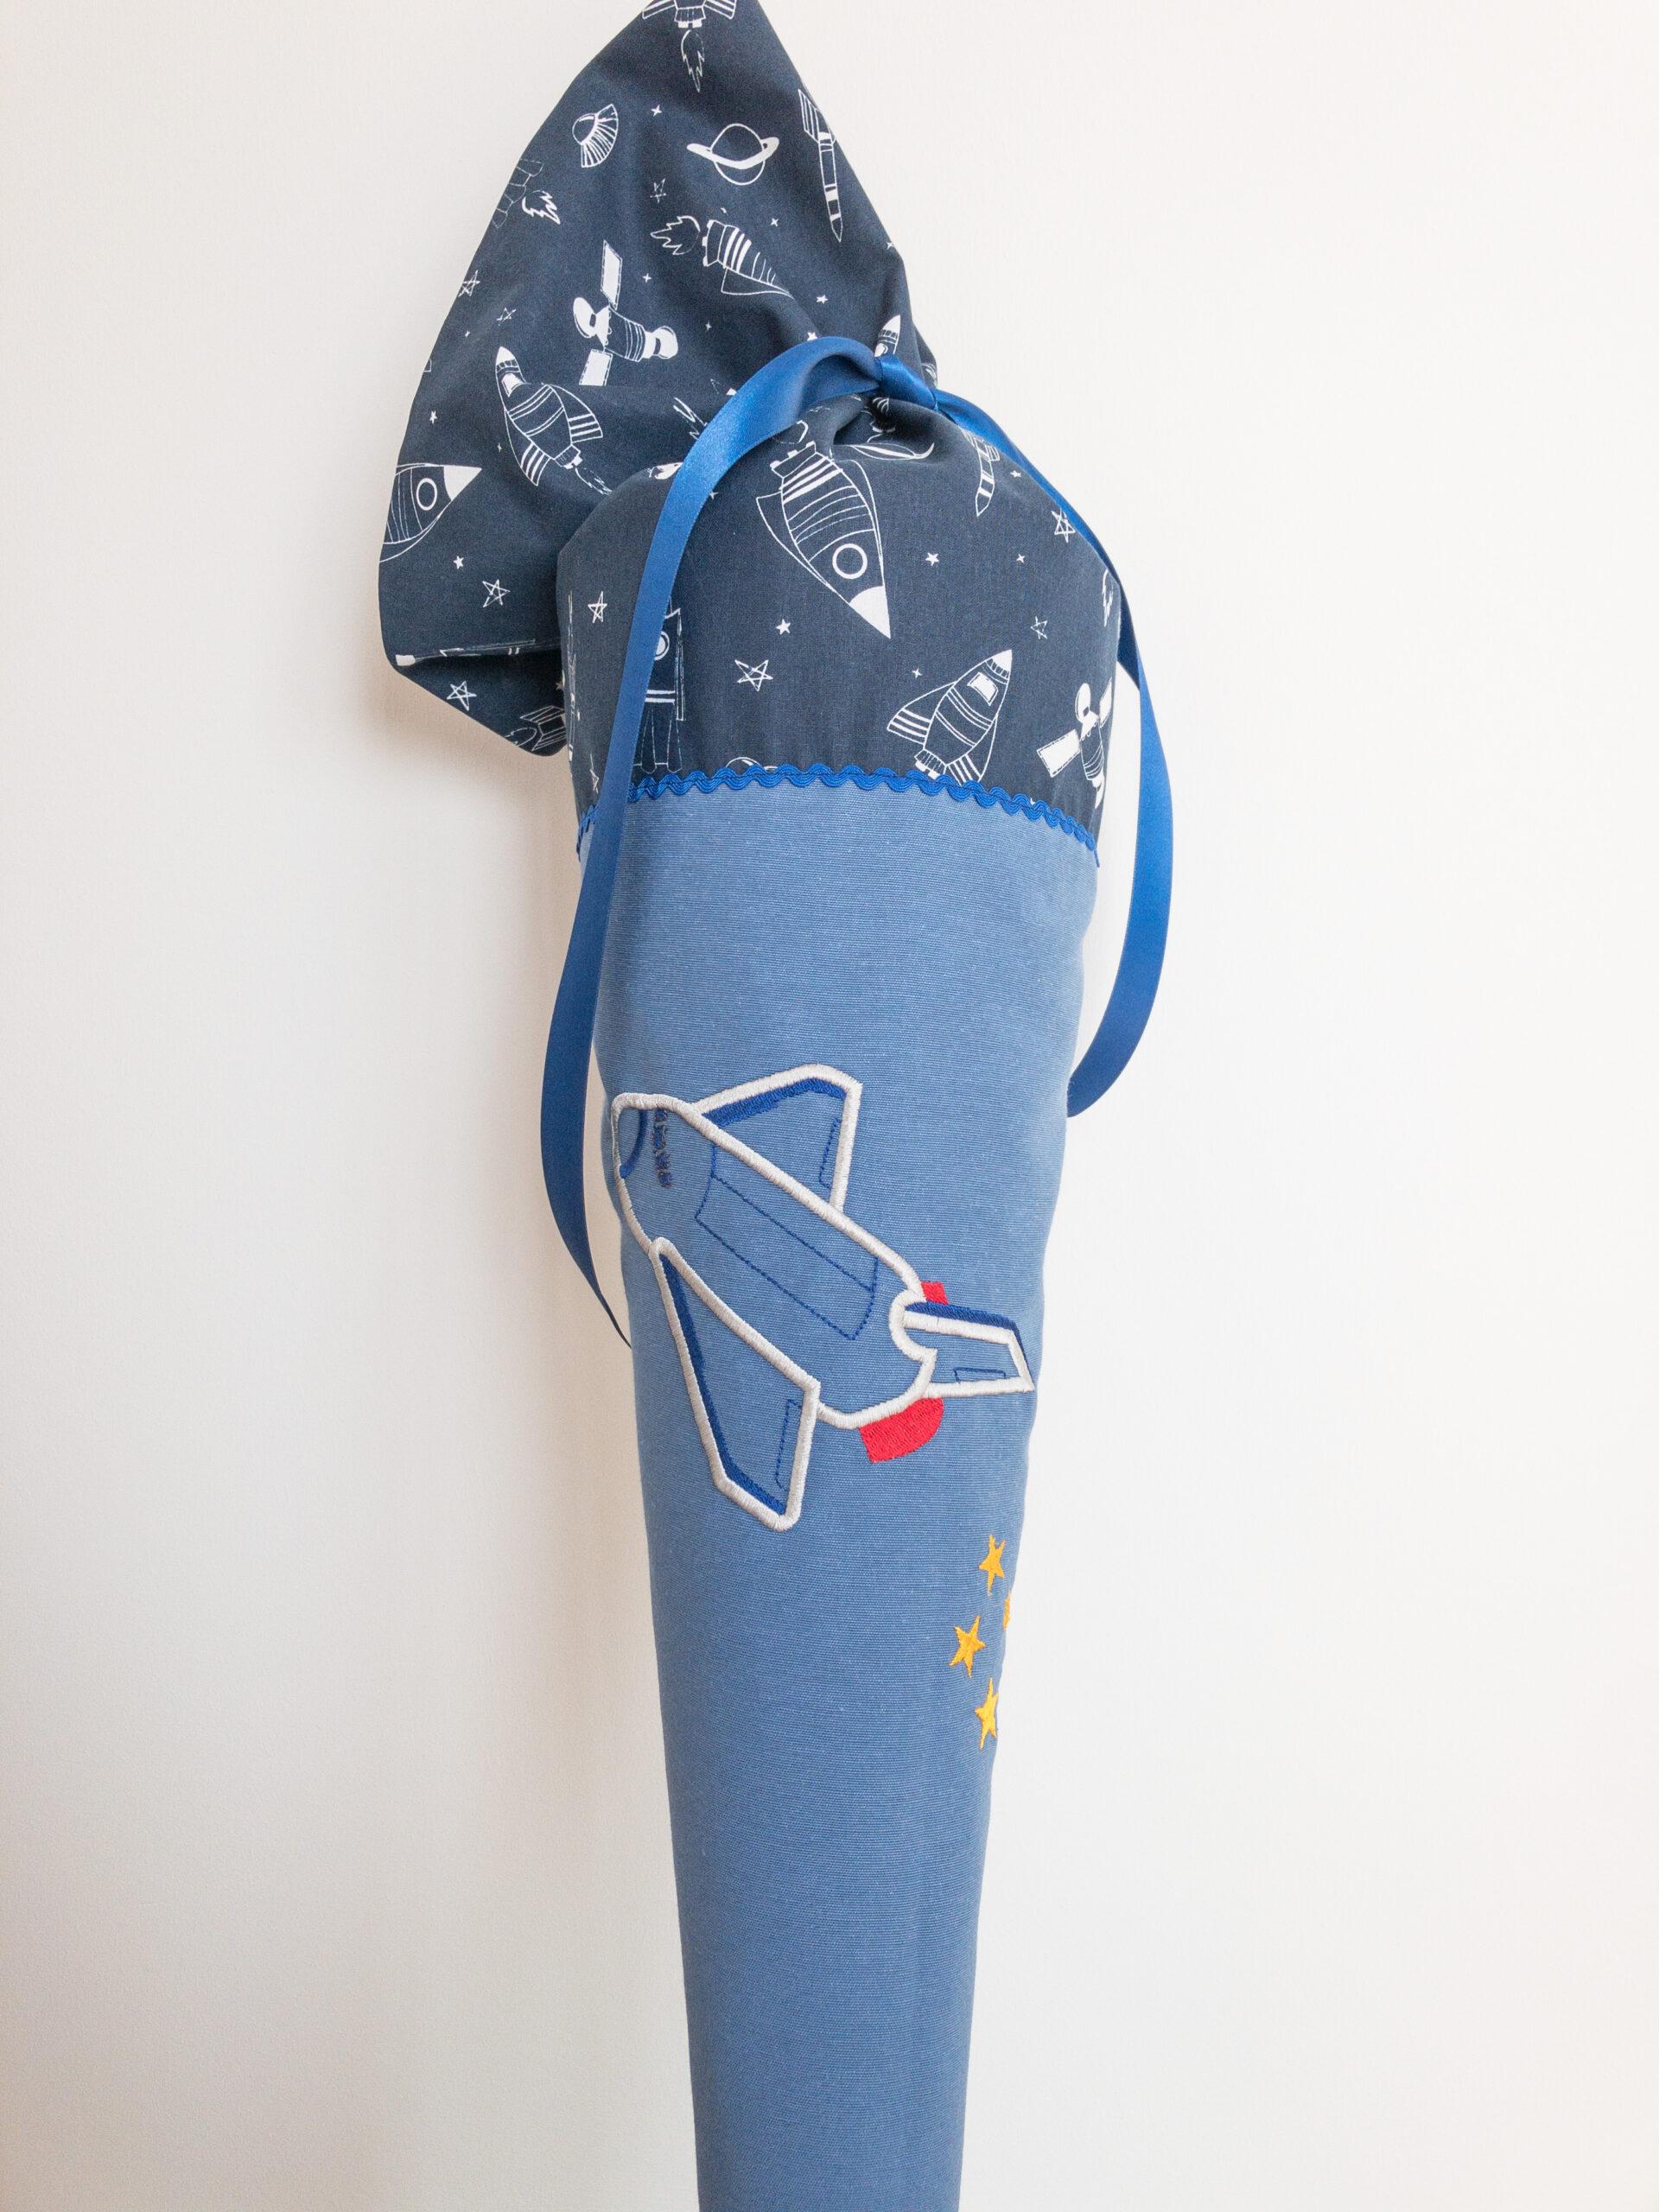 APC 0354 scaled - Schultüte  70 cm groß - Space Shuttle  -individualisierbar